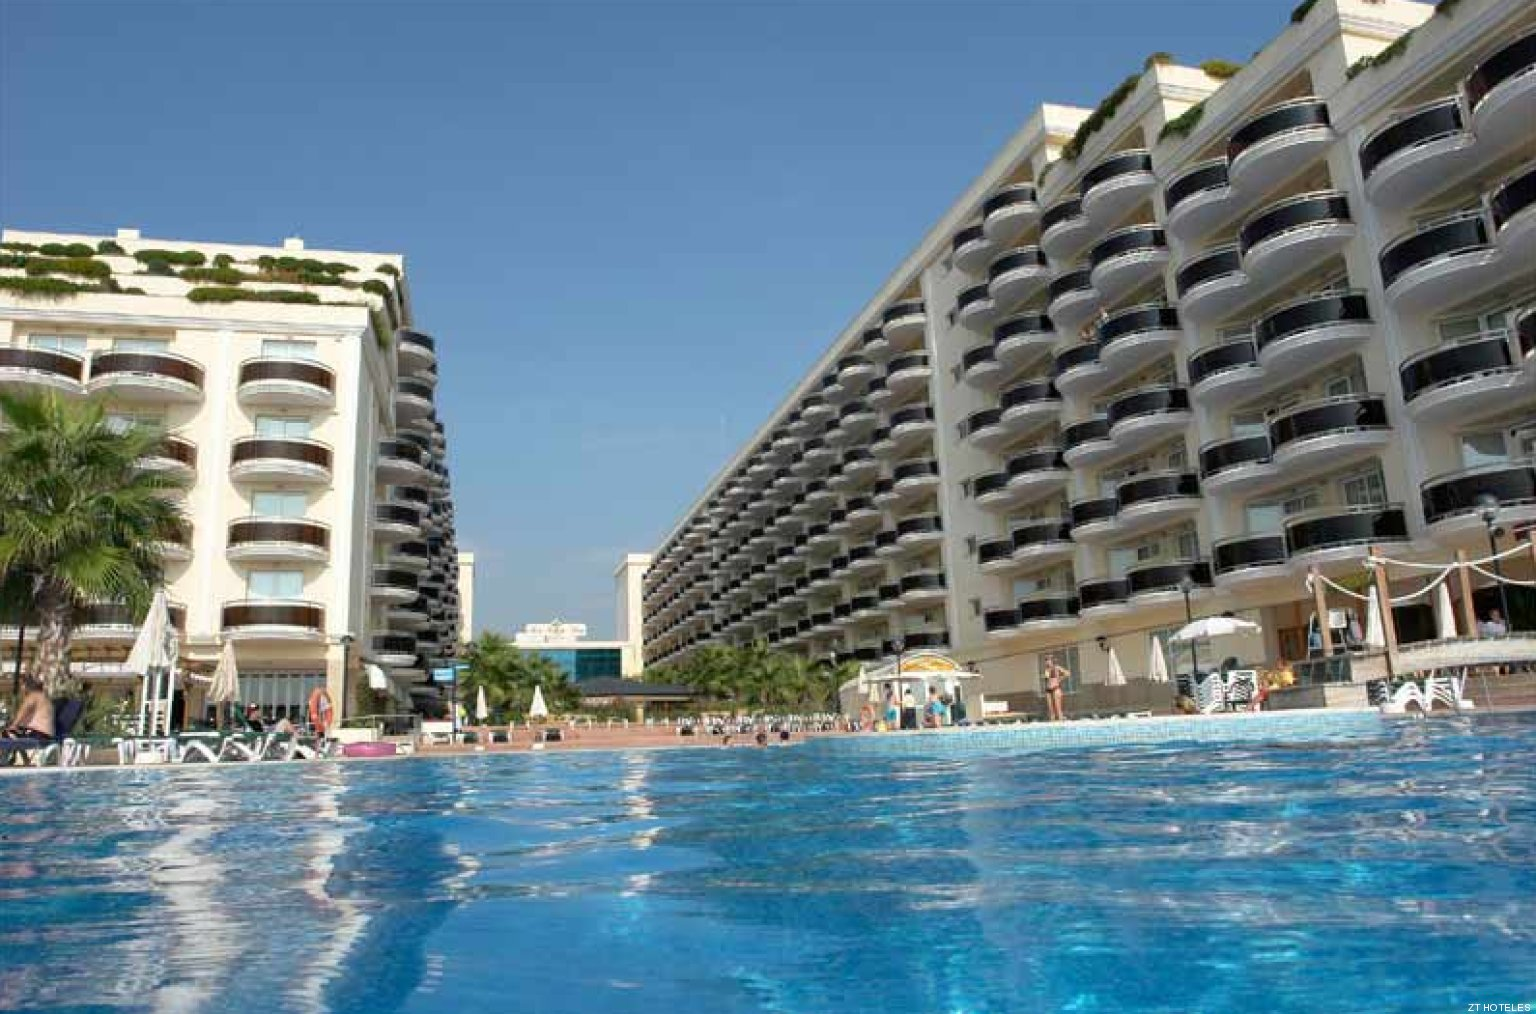 Denuncian que un hotel de Peníscola negó la estancia a un grupo de discapacitados